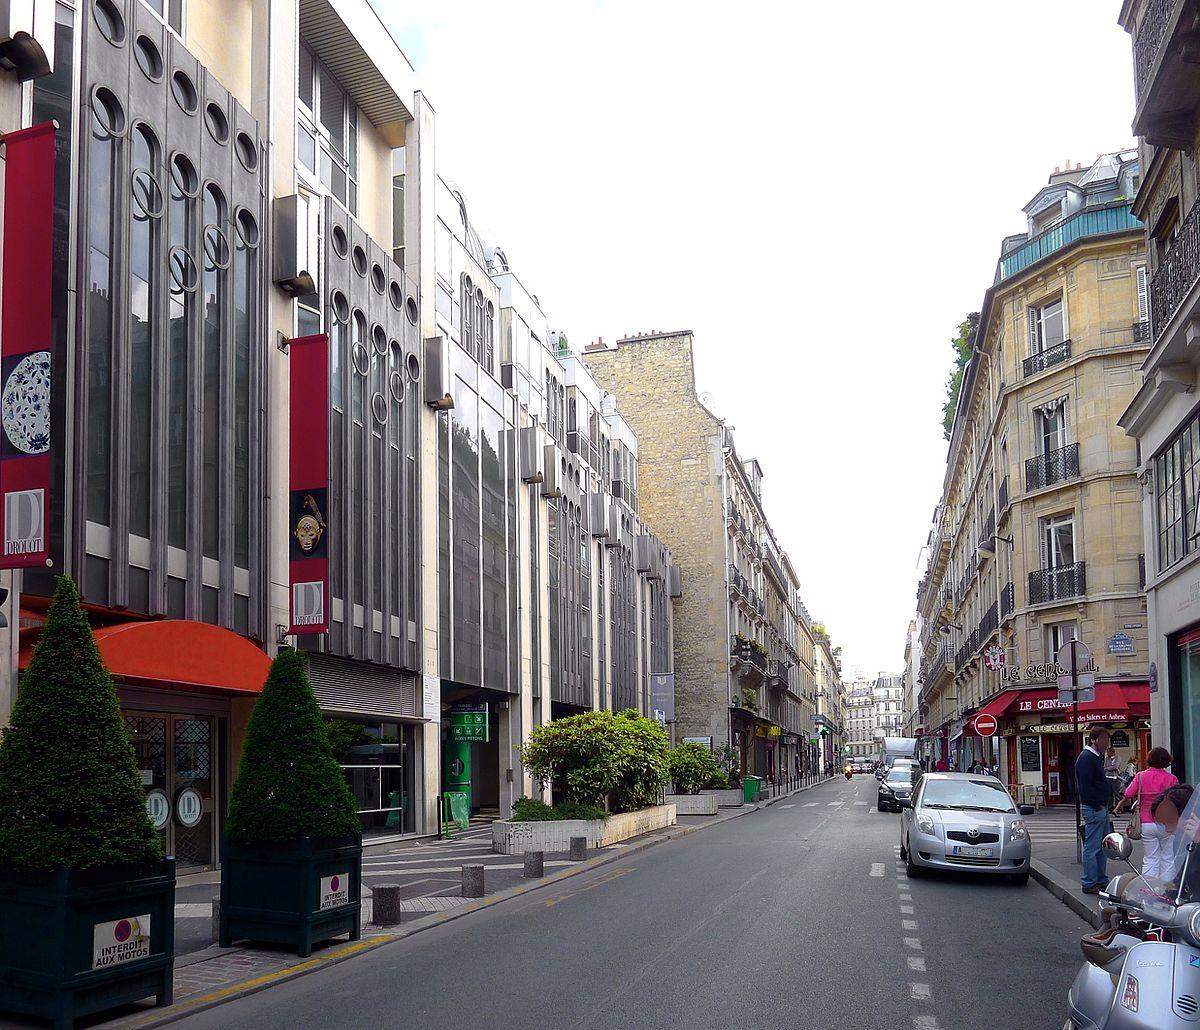 Ͽ���������� Ͽ������������ Ͽ���������� Ͽ���������� Ͽ�� Ͽ���������� Ͽ������������: Hôtel Drouot